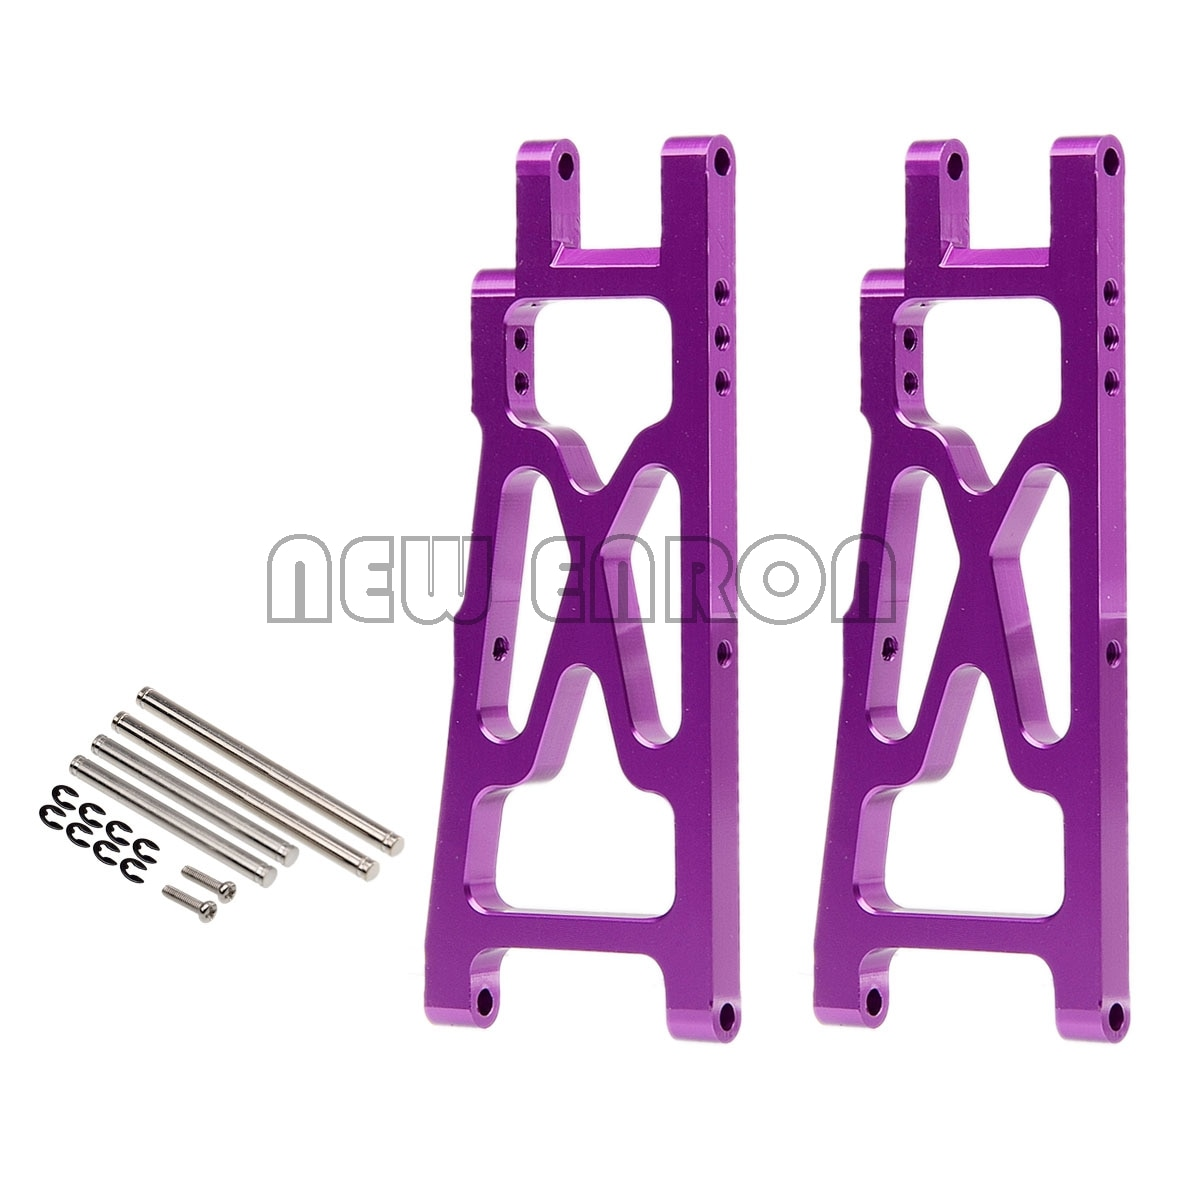 NEUE ENRON 2Pcs Aluminium Rear Lower Suspension Arm Set #85074 FÜR RC AUTO 1/10 HPI NITRO RS4 MT 2 18SS RTR G 3,0 18SS + KIT